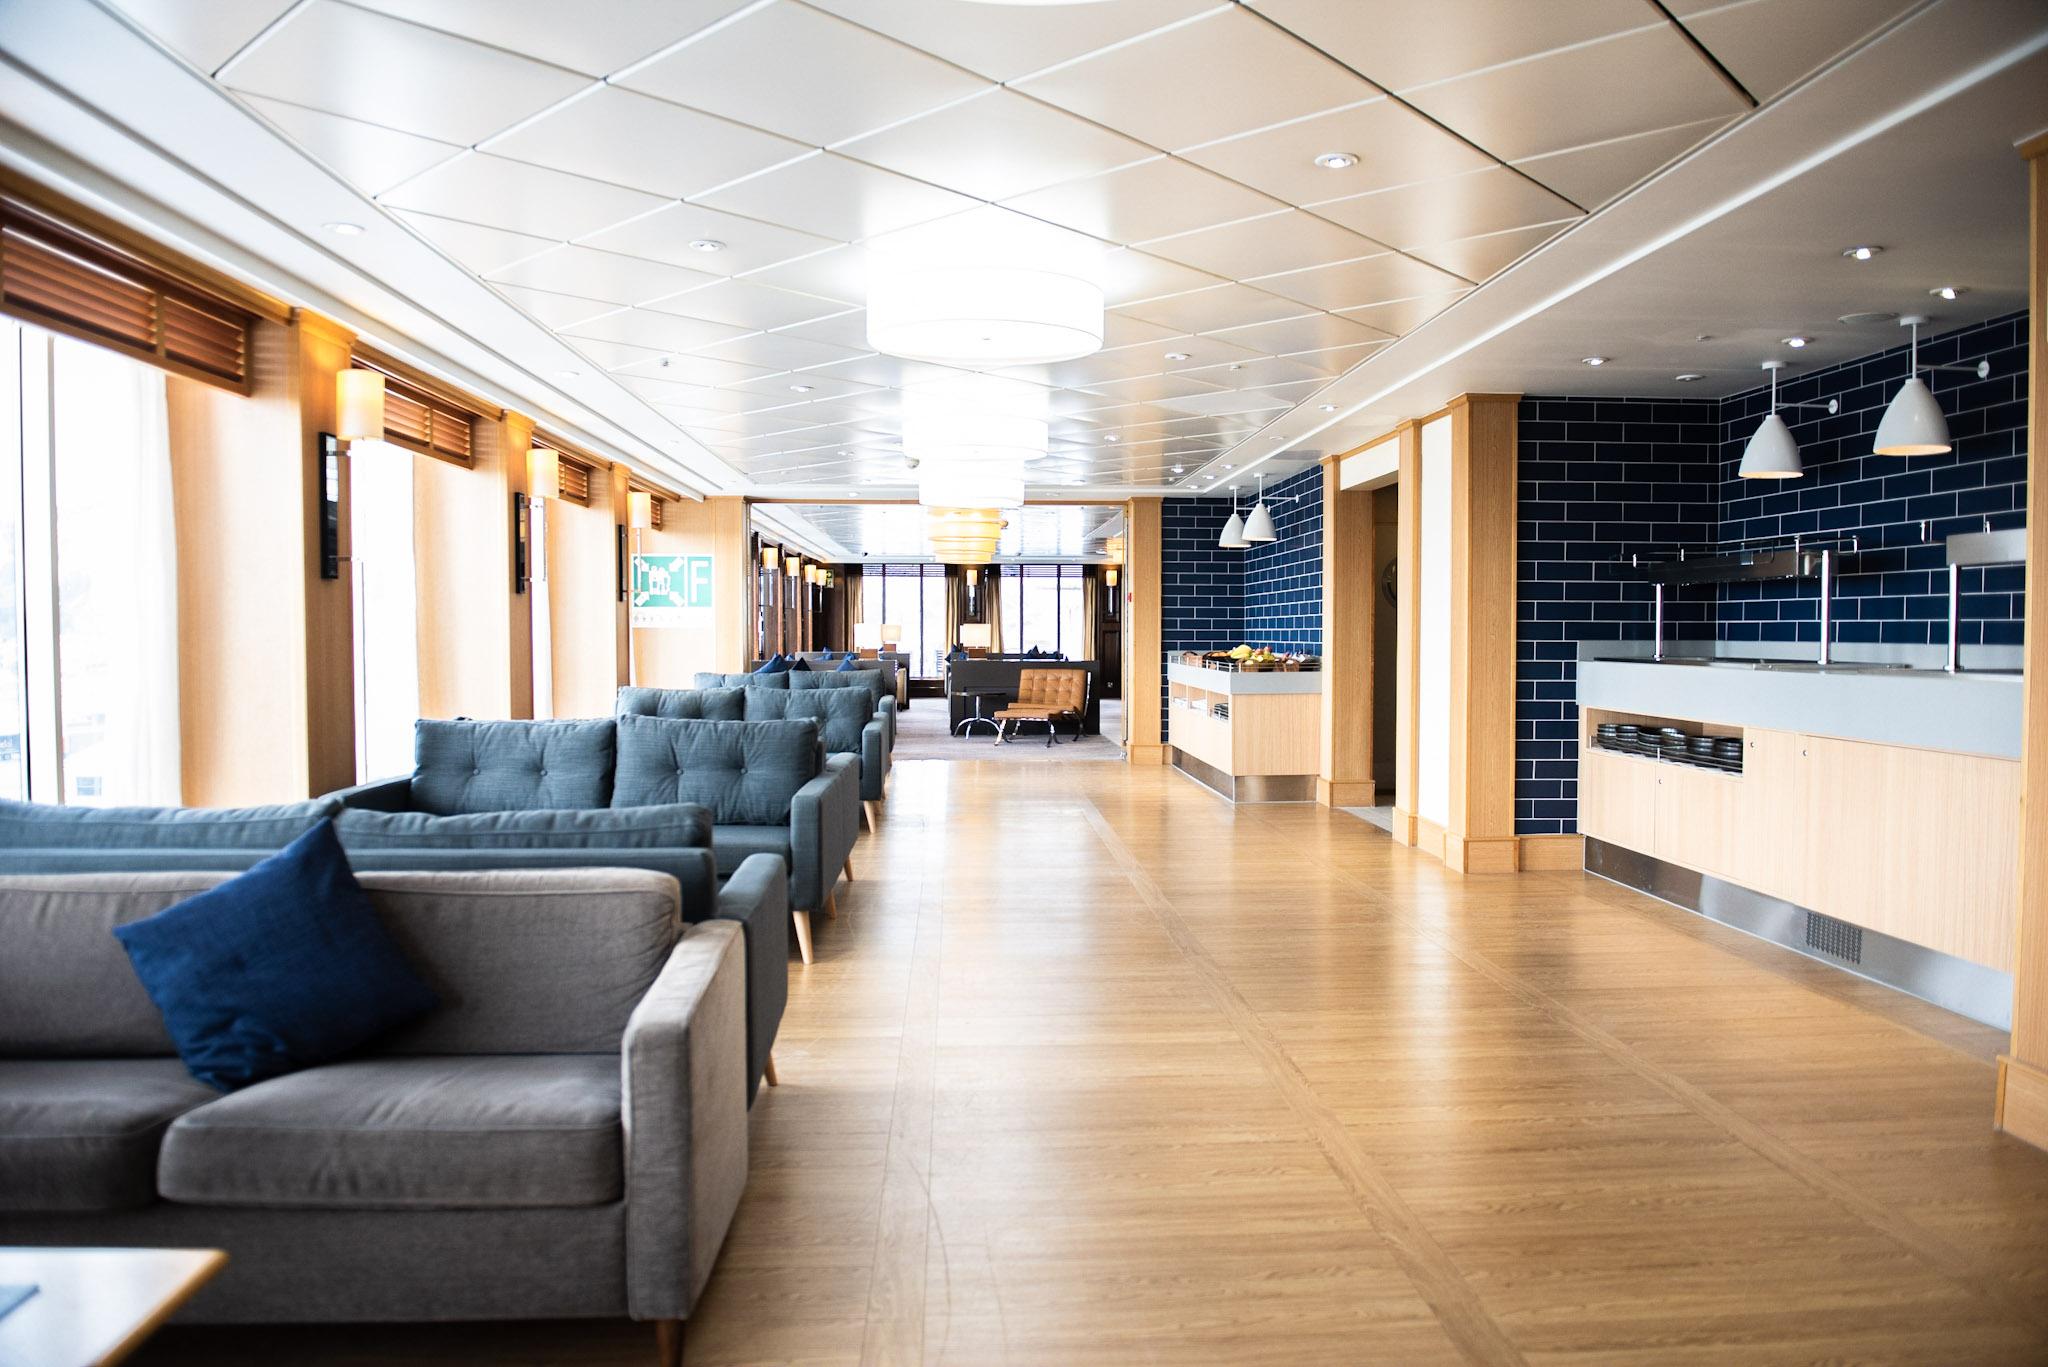 Dover to Calais P&O Ferries Club Lounge